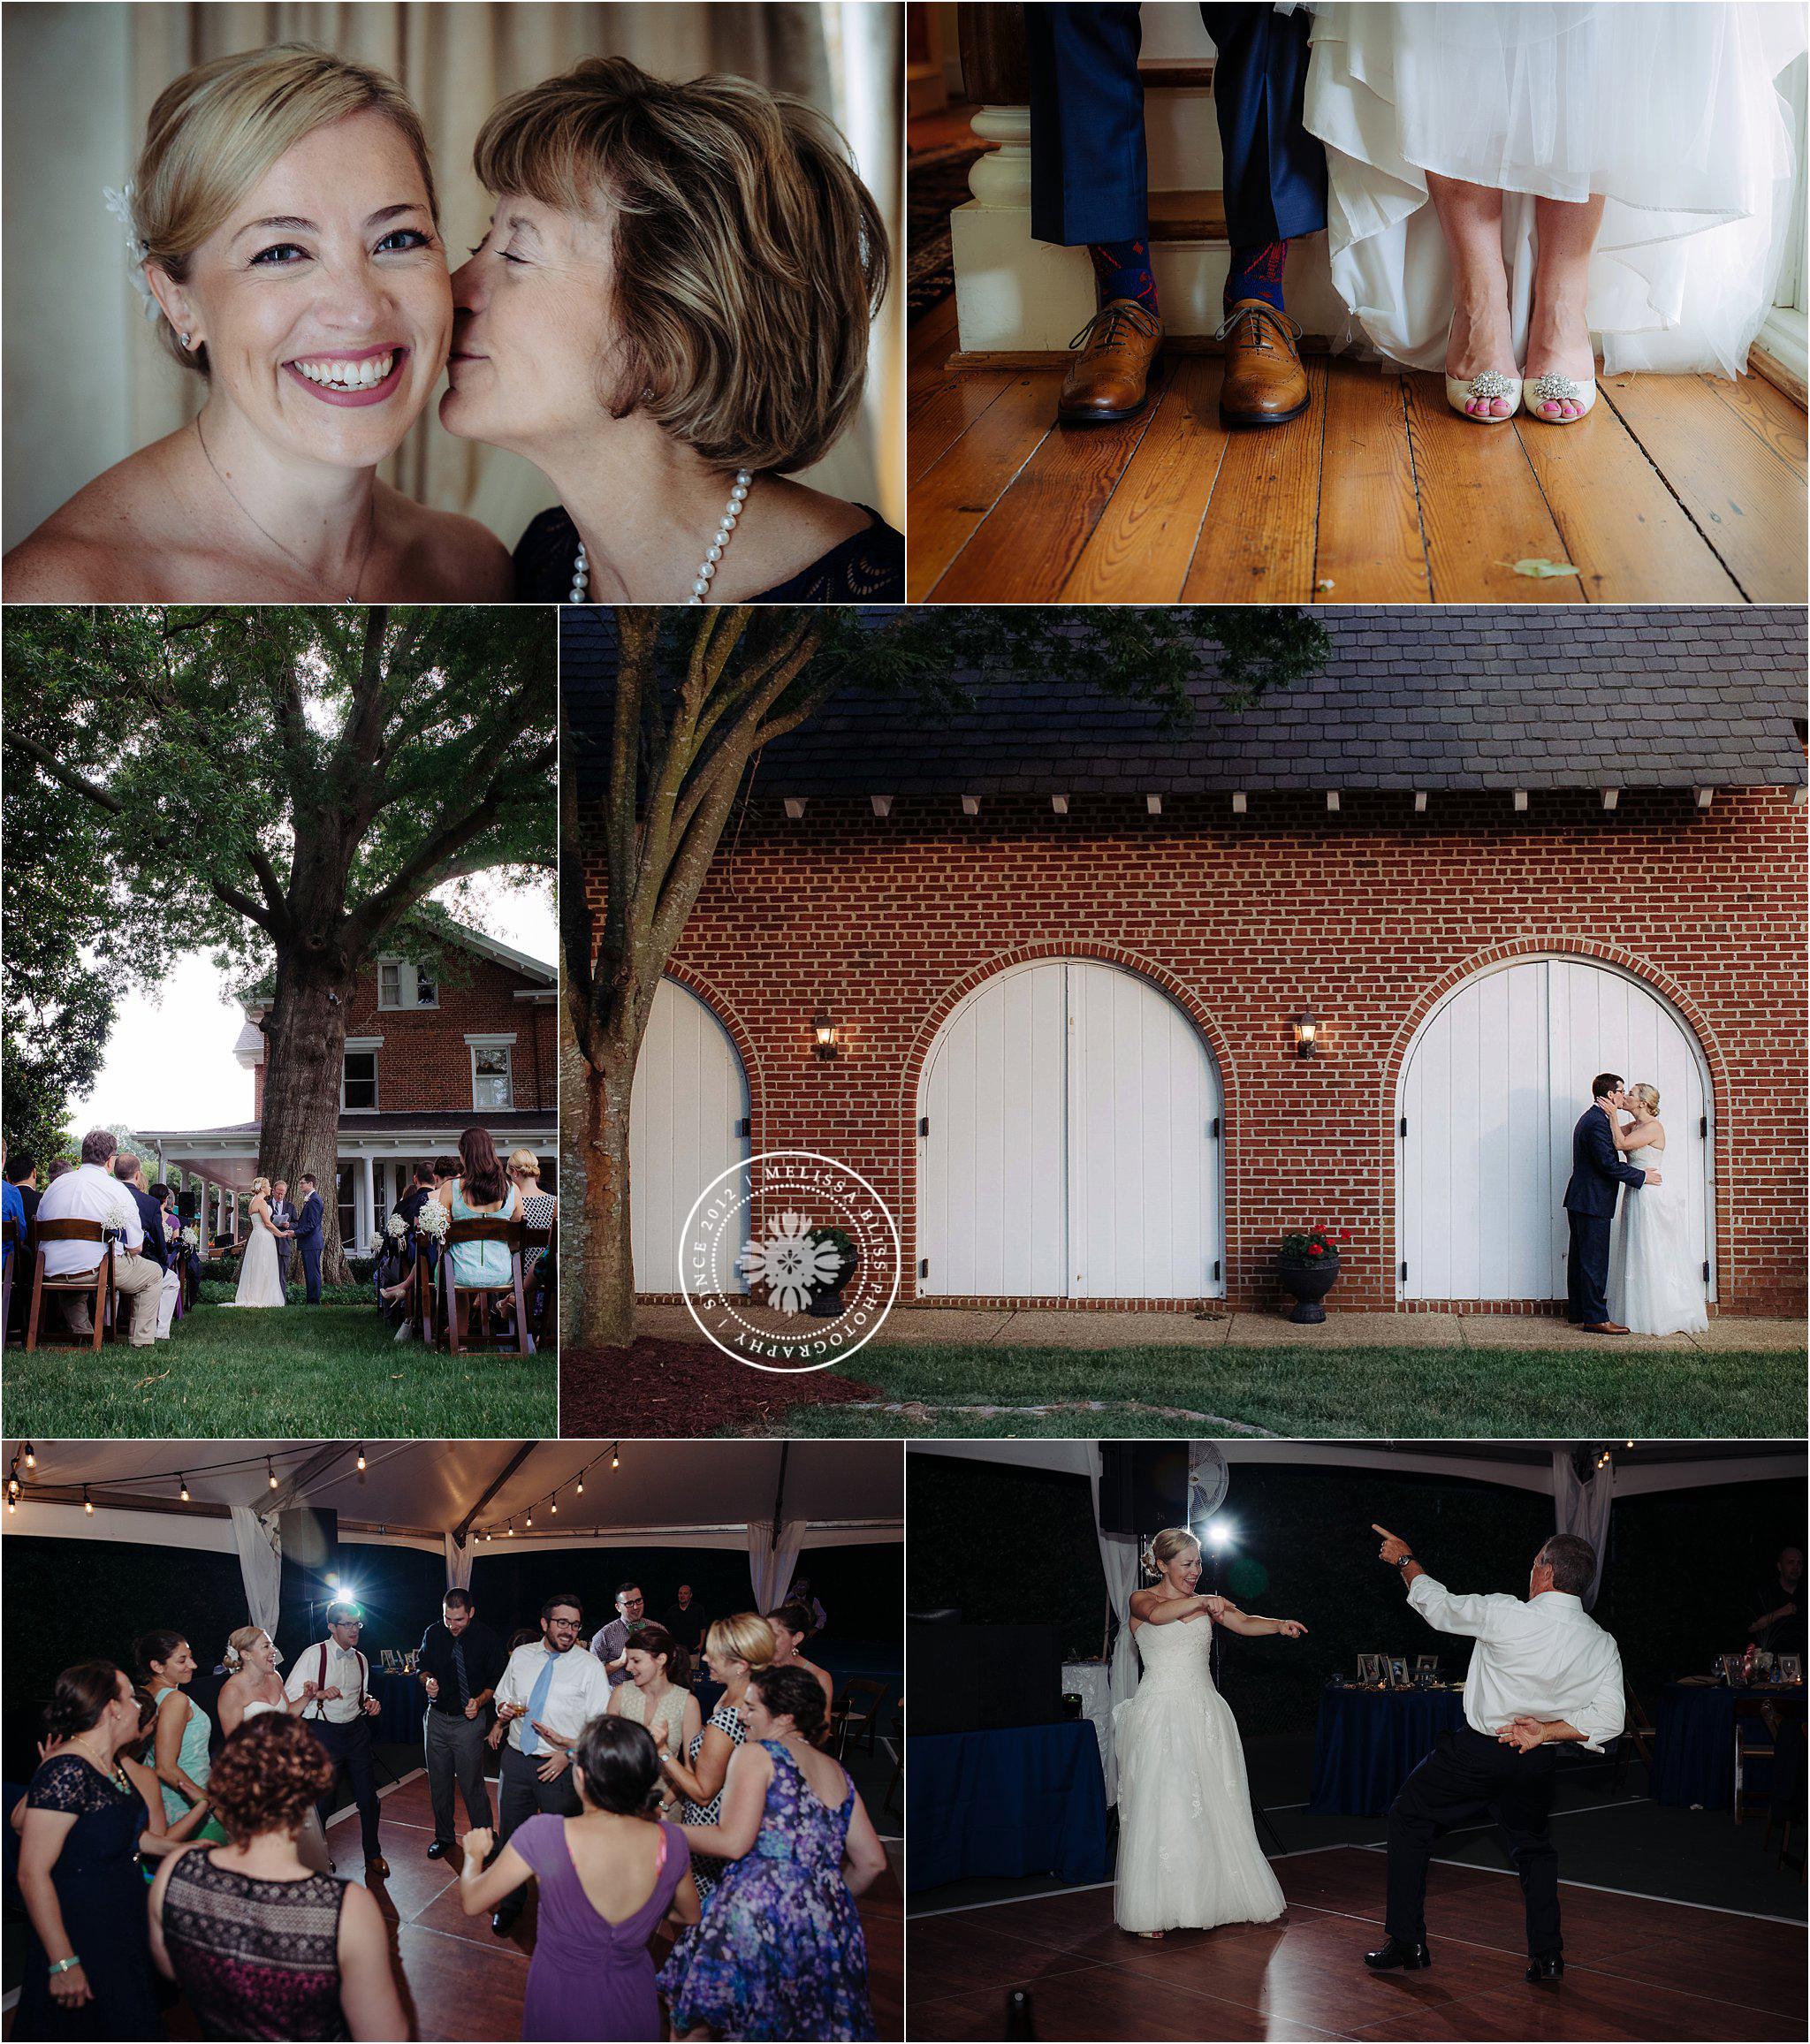 norfolk-portsmouth-virginia-beach-sandbridge-wedding-photographers-melissa-bliss-photography-church-point-manor-bed-and-breakfast-wedding